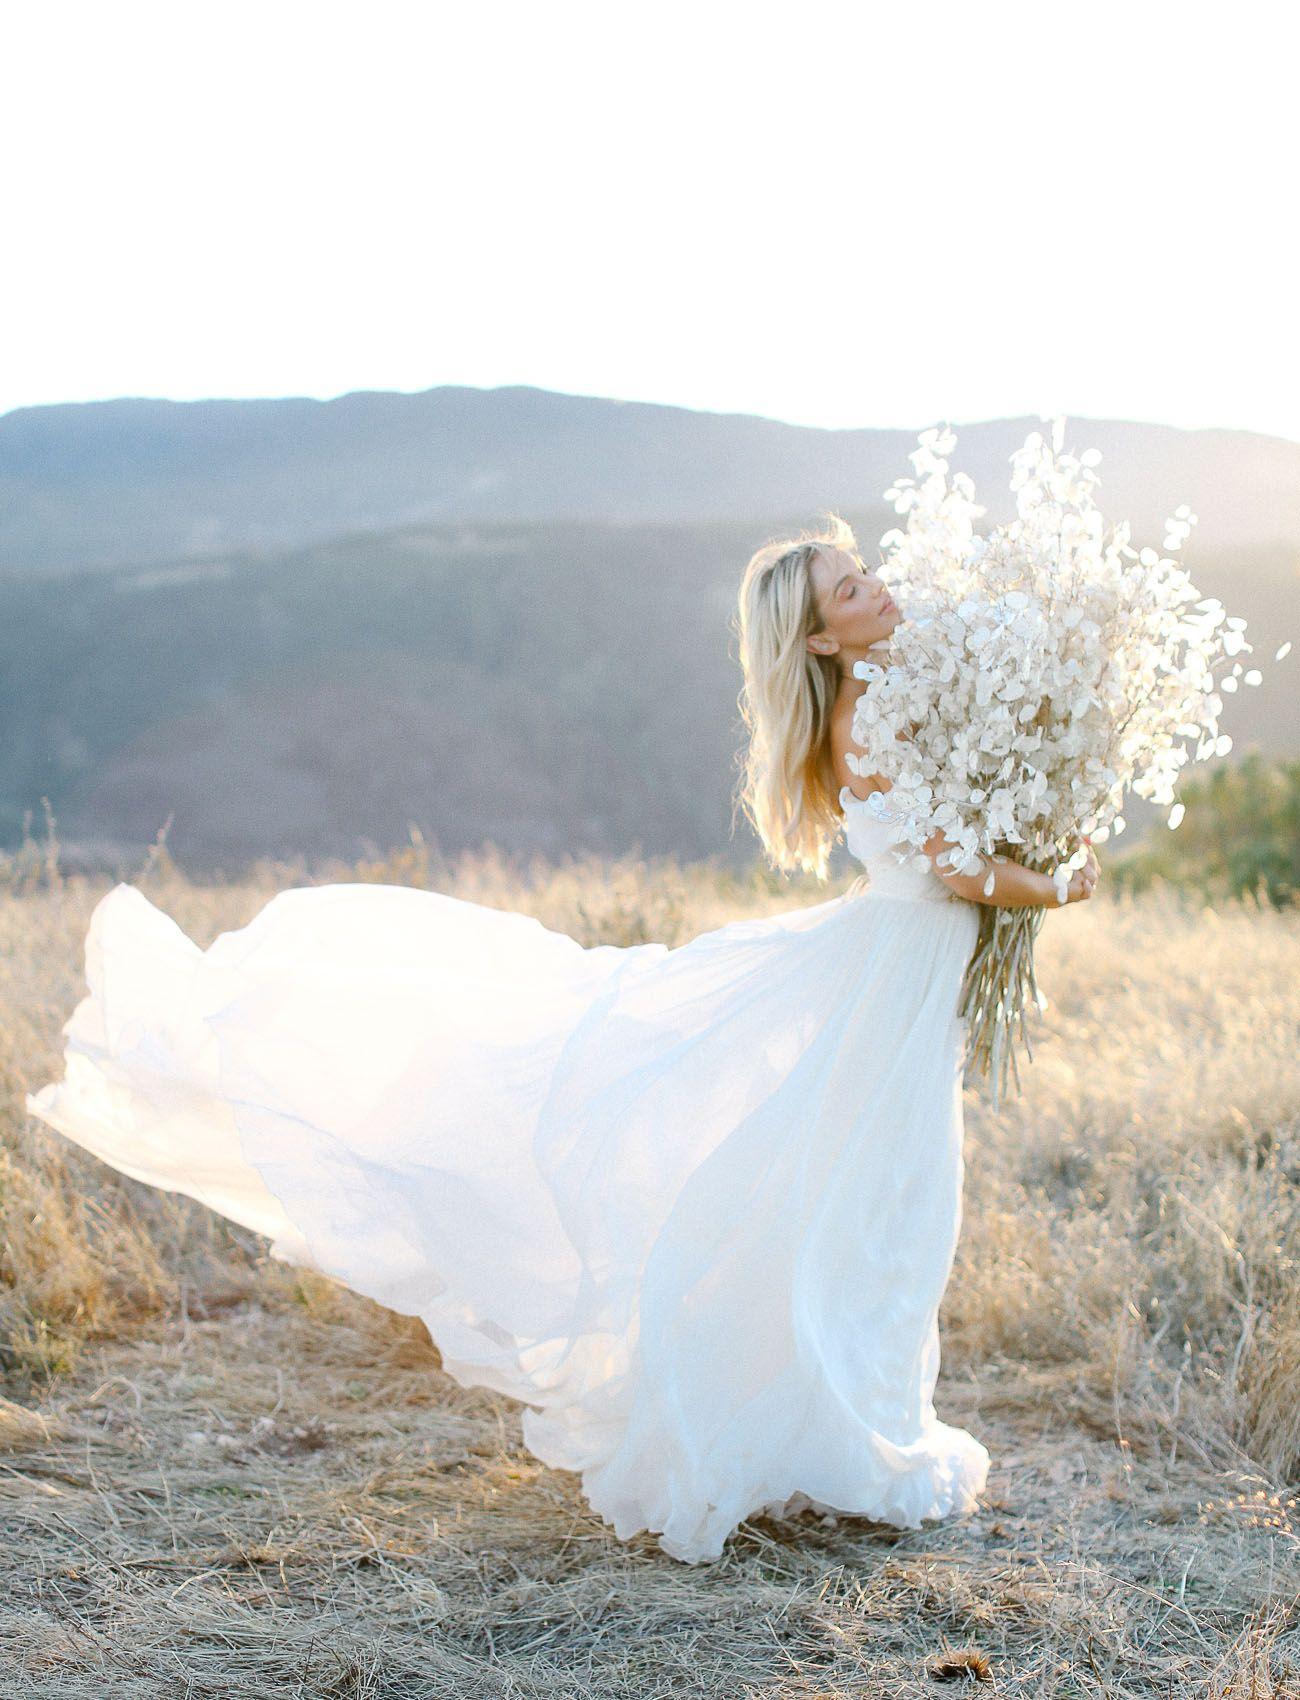 Old world meets california wedding inspiration silver dollar